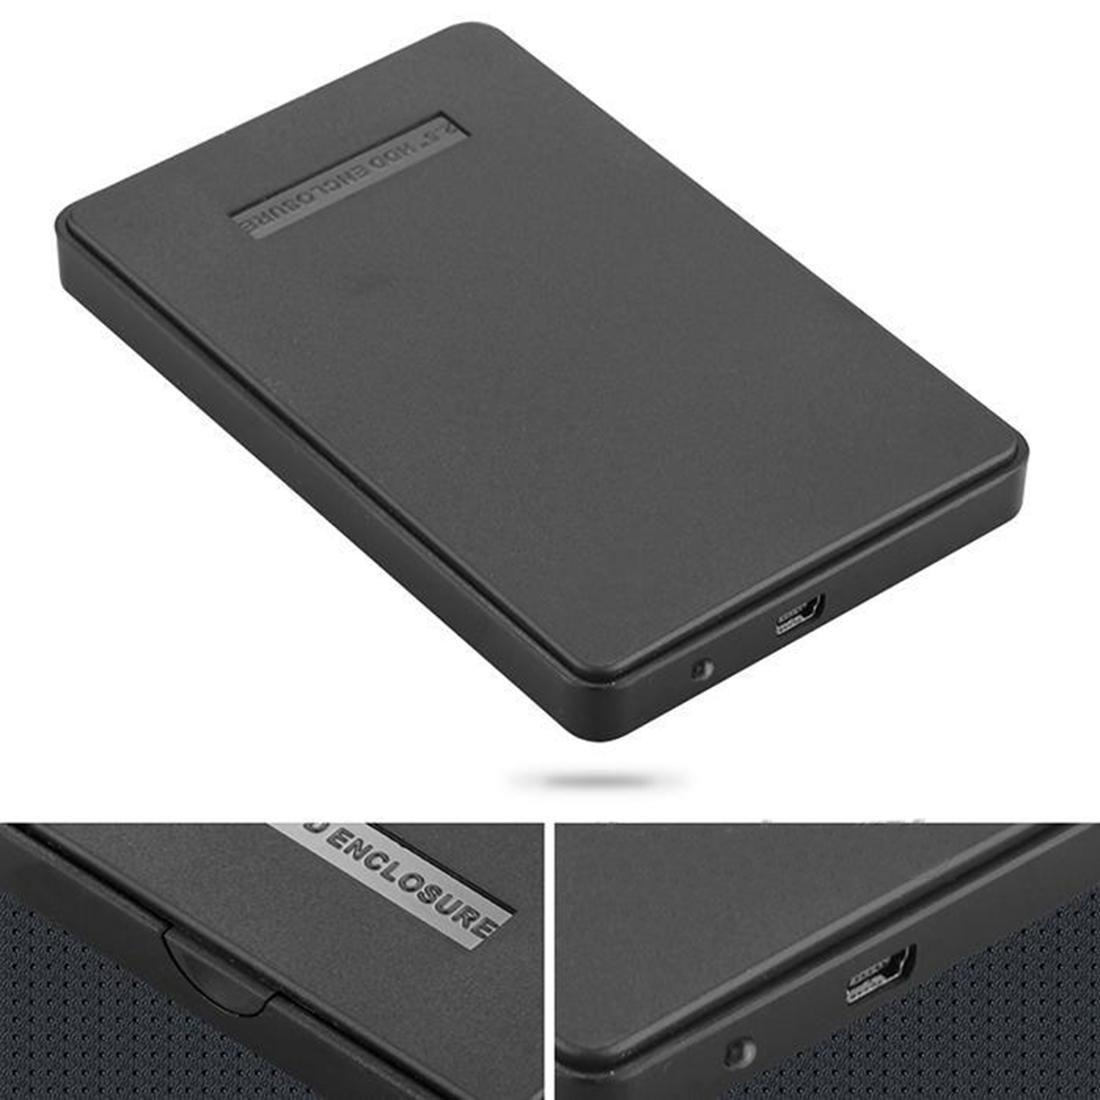 NOYOKERE Externes Gehäuse für Festplatte Usb 2.0 Sata Durable Tragbare Fall Hdd 2,5